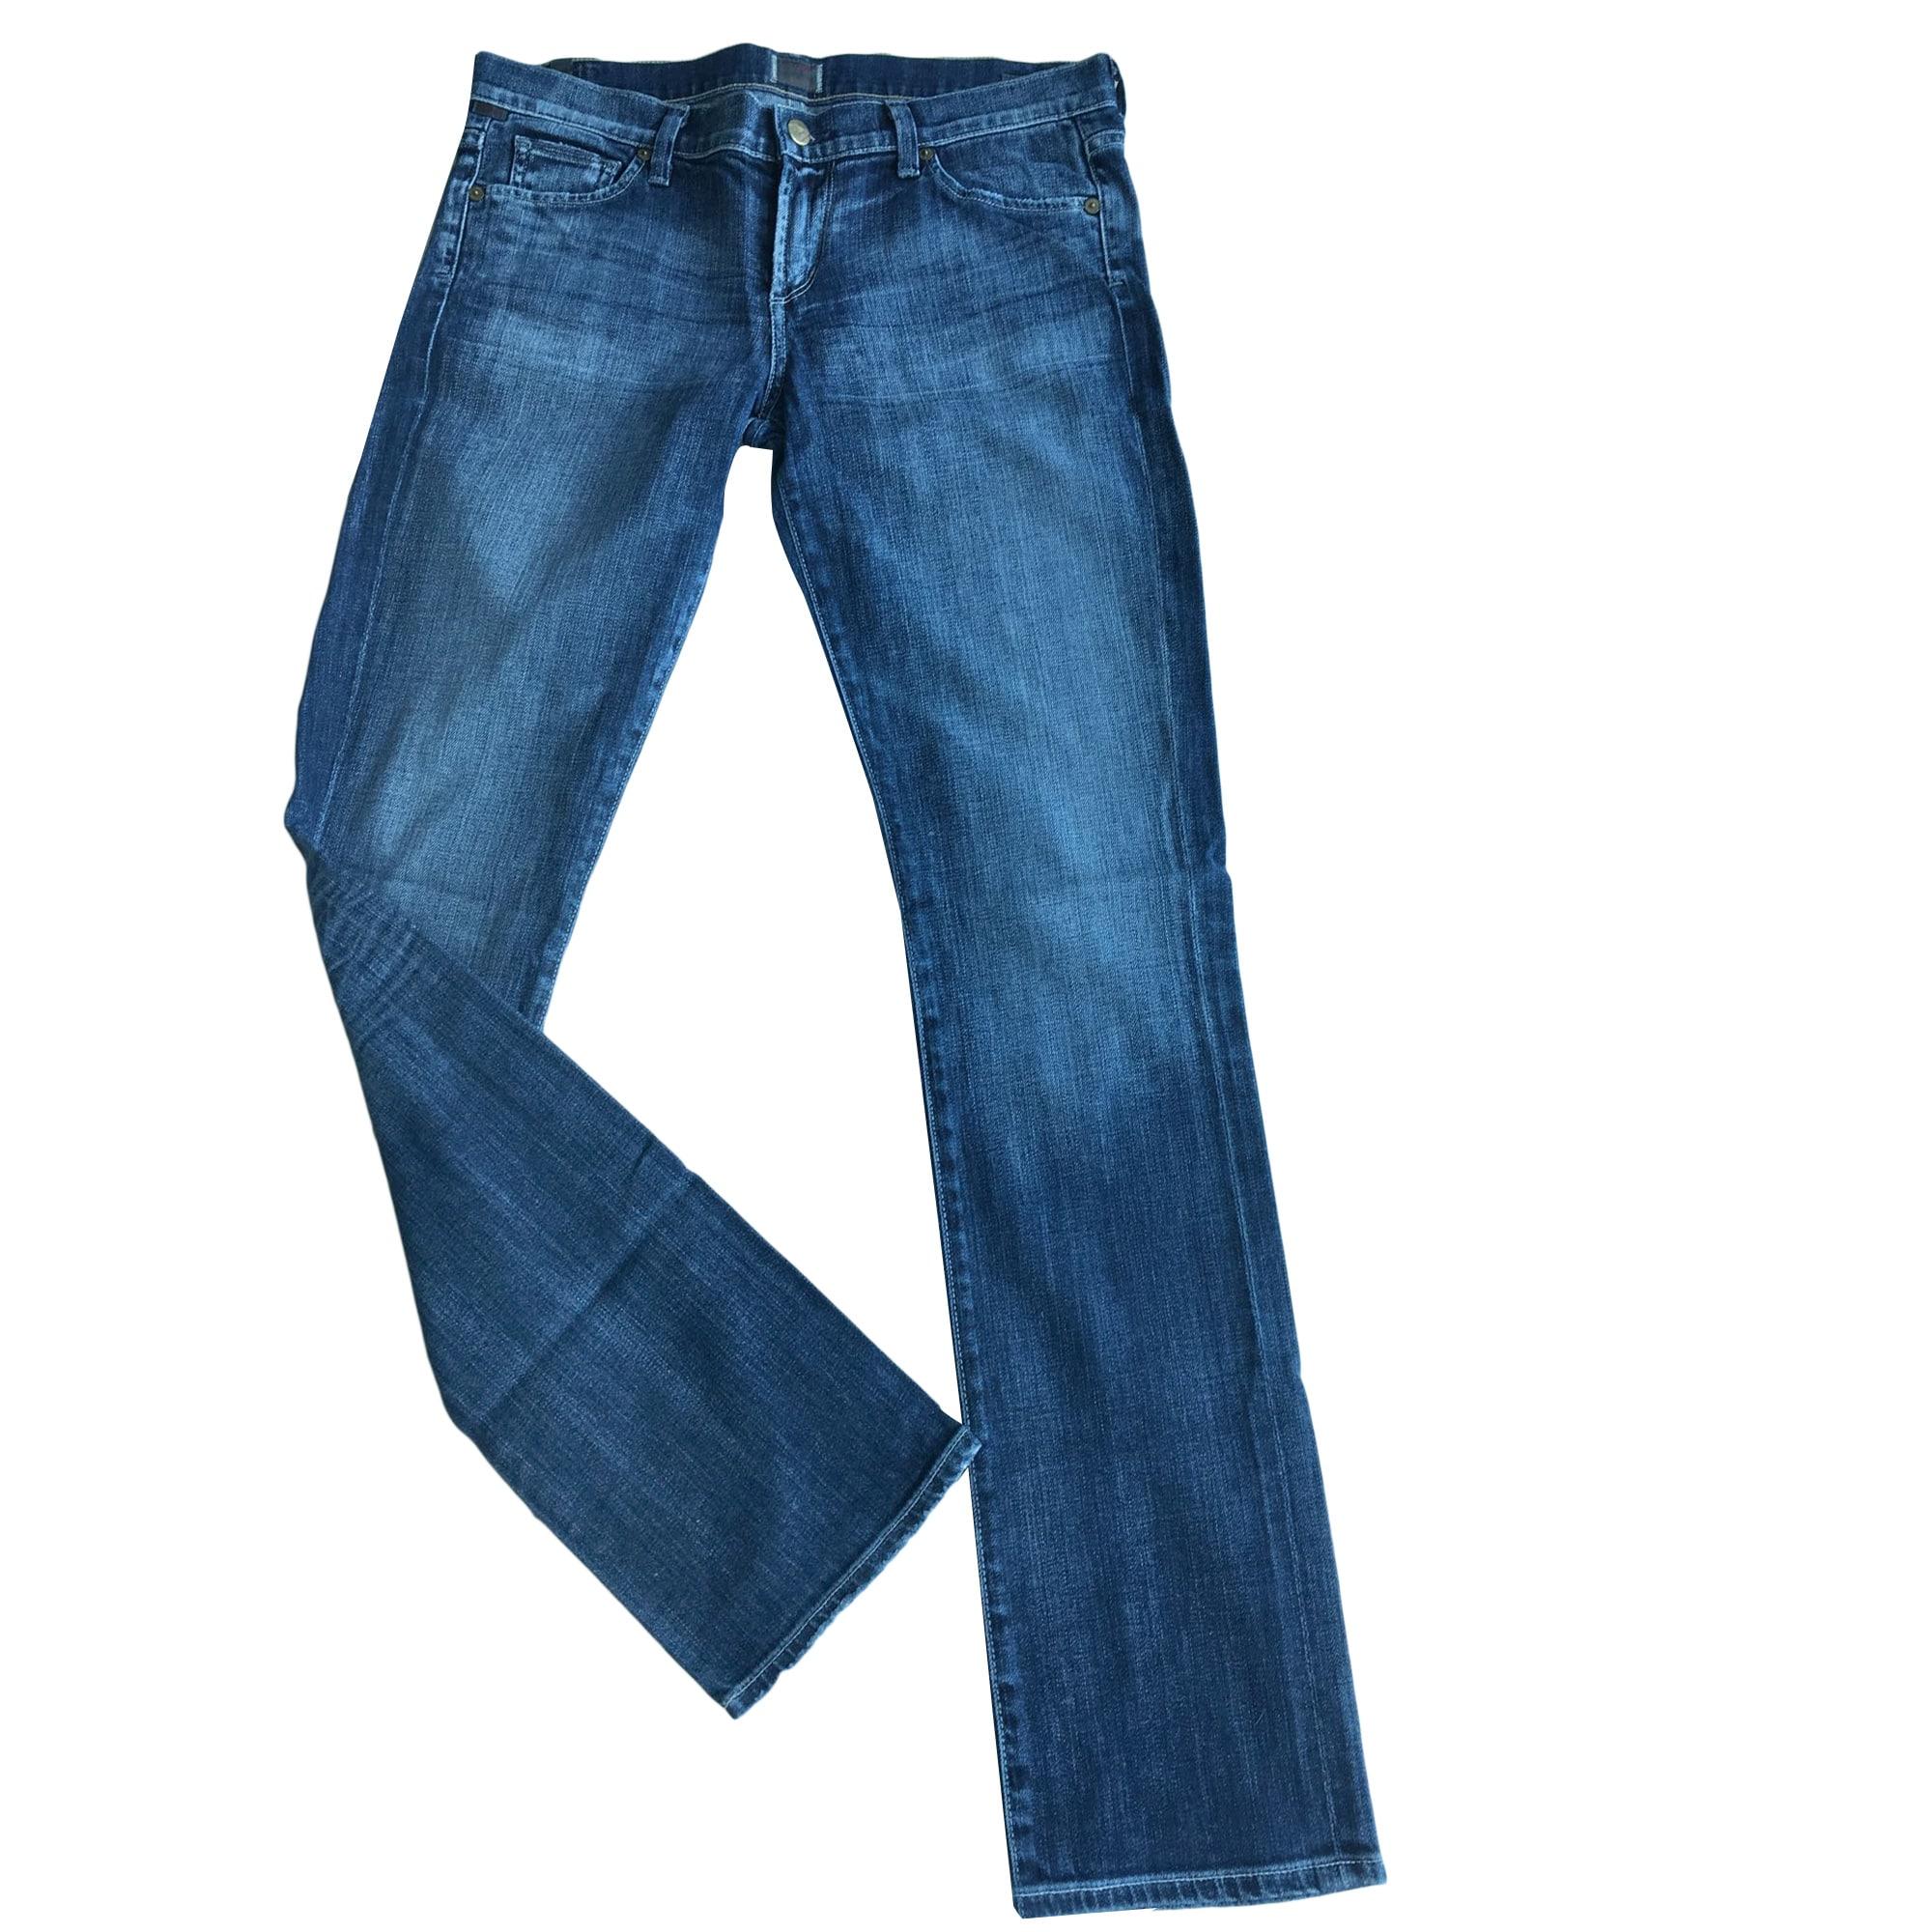 Jeans slim CITIZENS OF HUMANITY Bleu, bleu marine, bleu turquoise